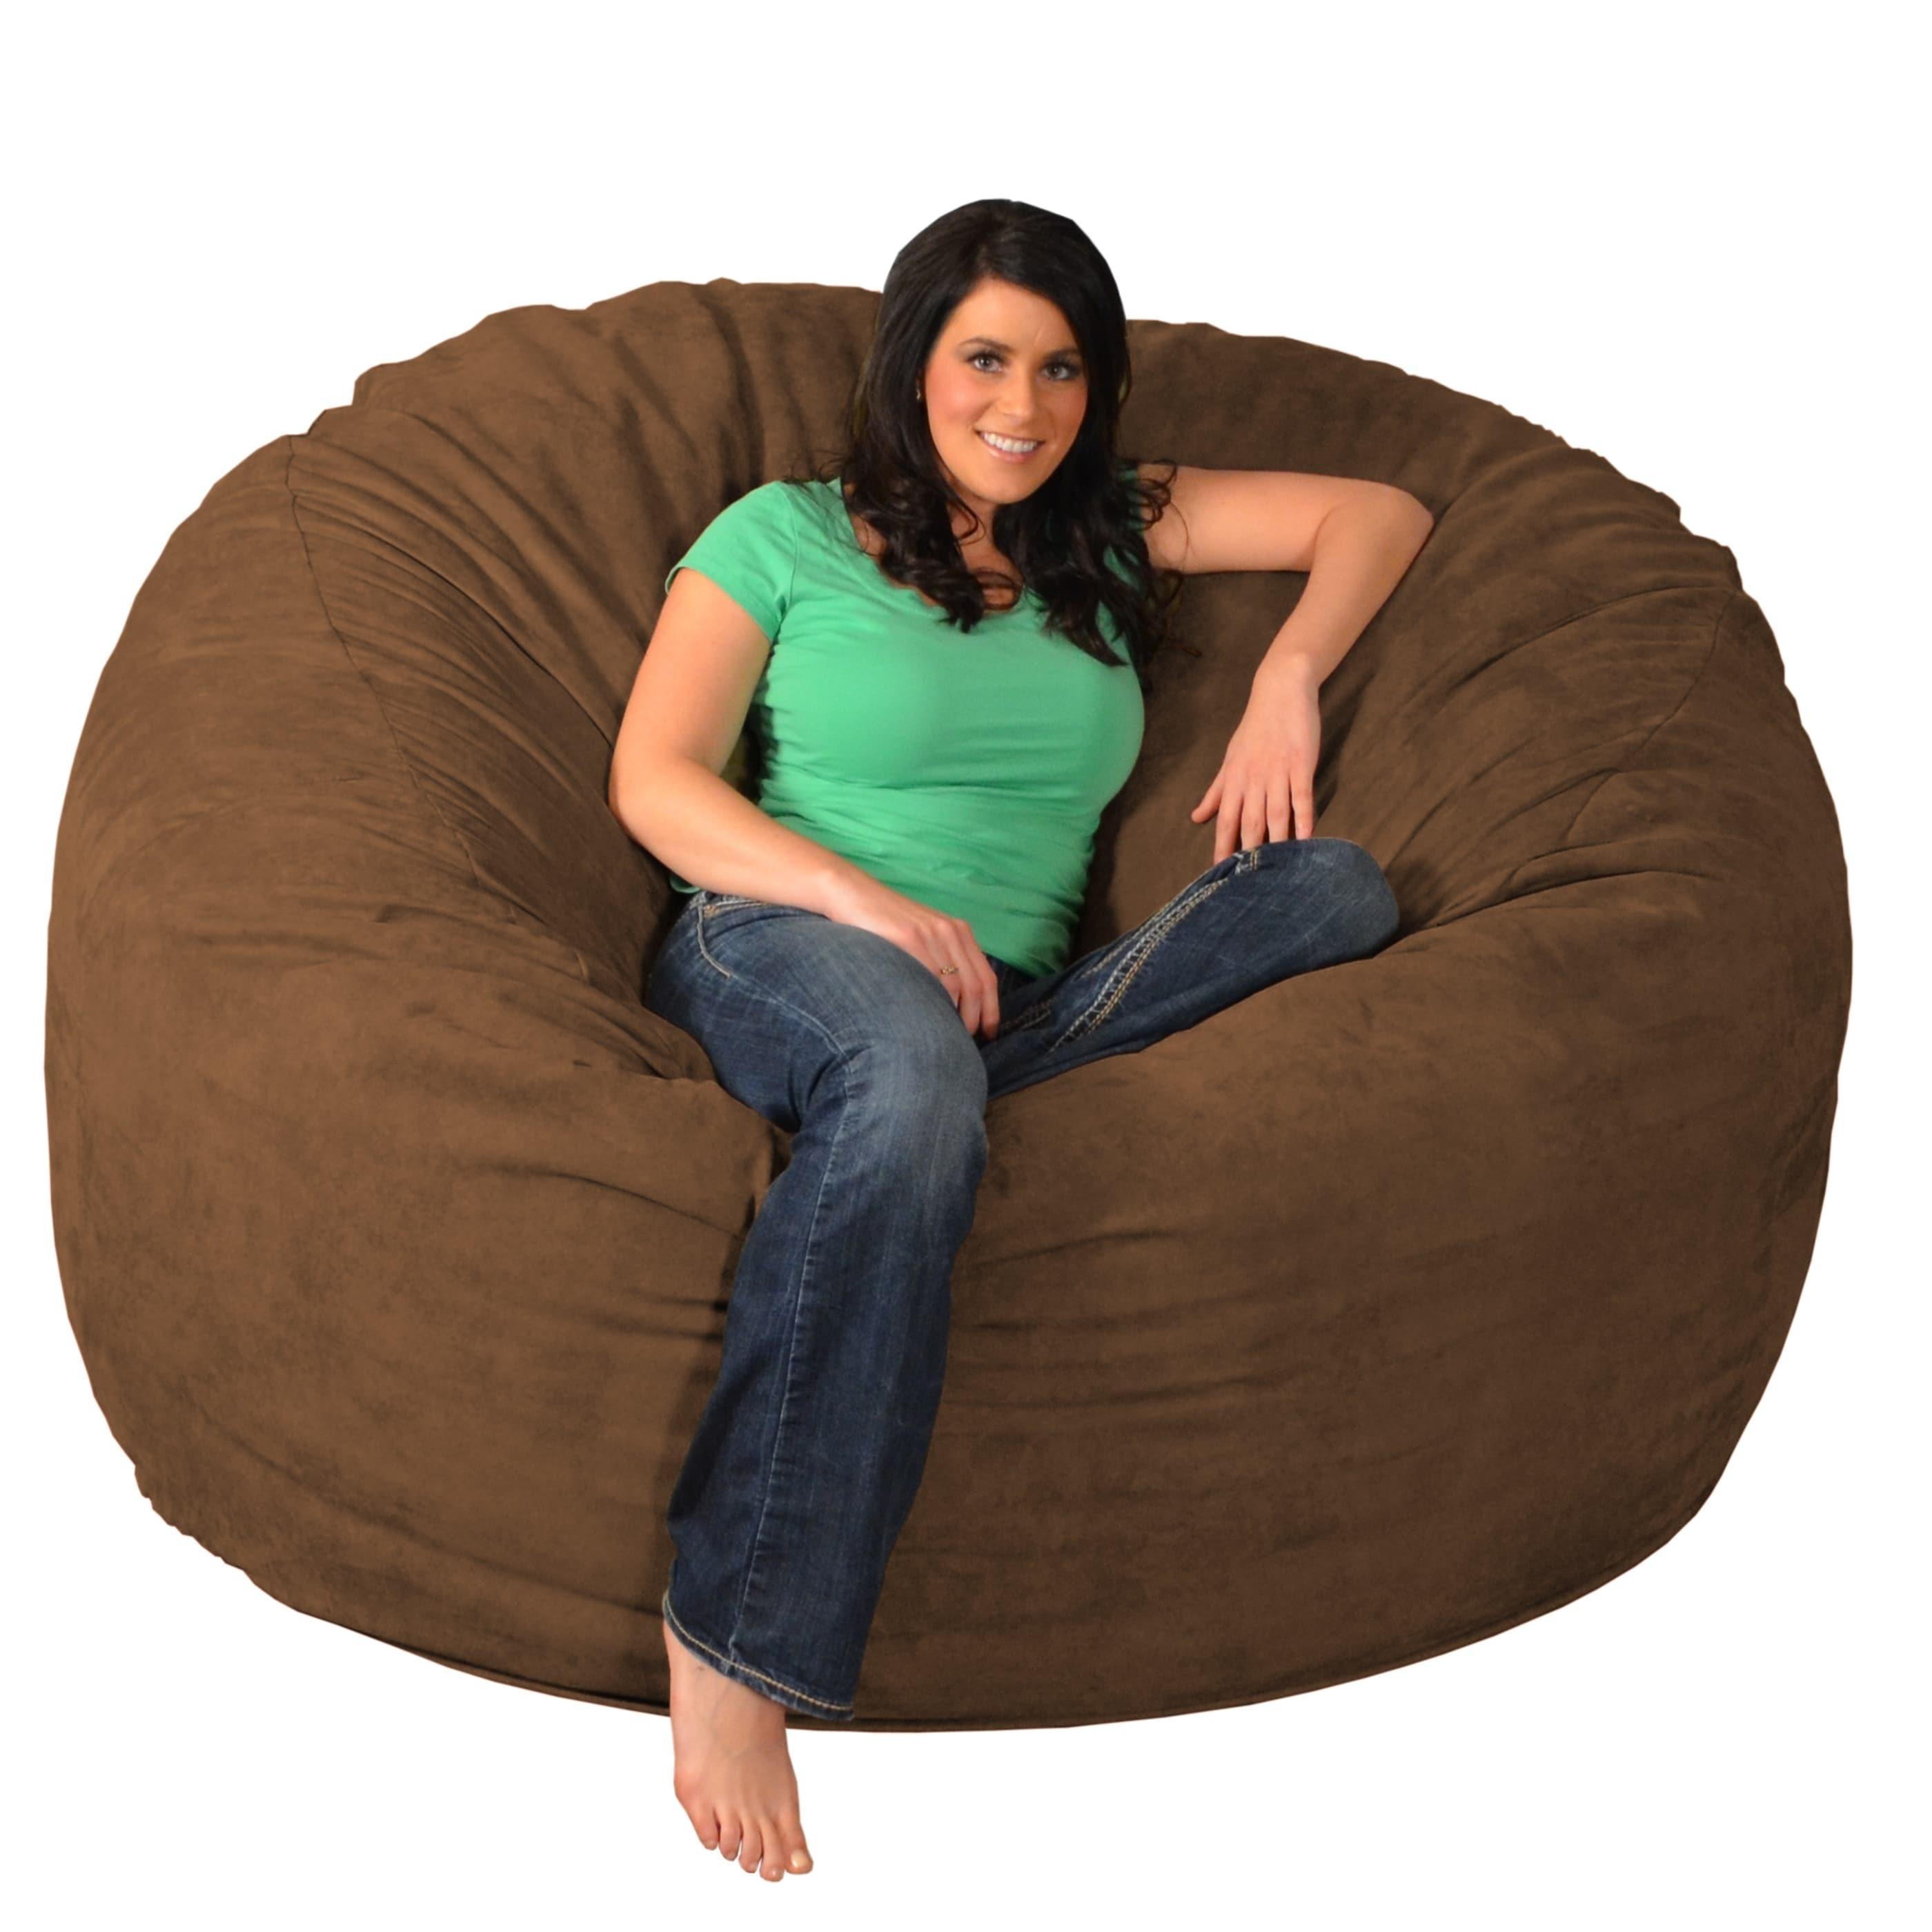 6 foot bean bag chair small swivel chairs for living room giant memory foam ebay